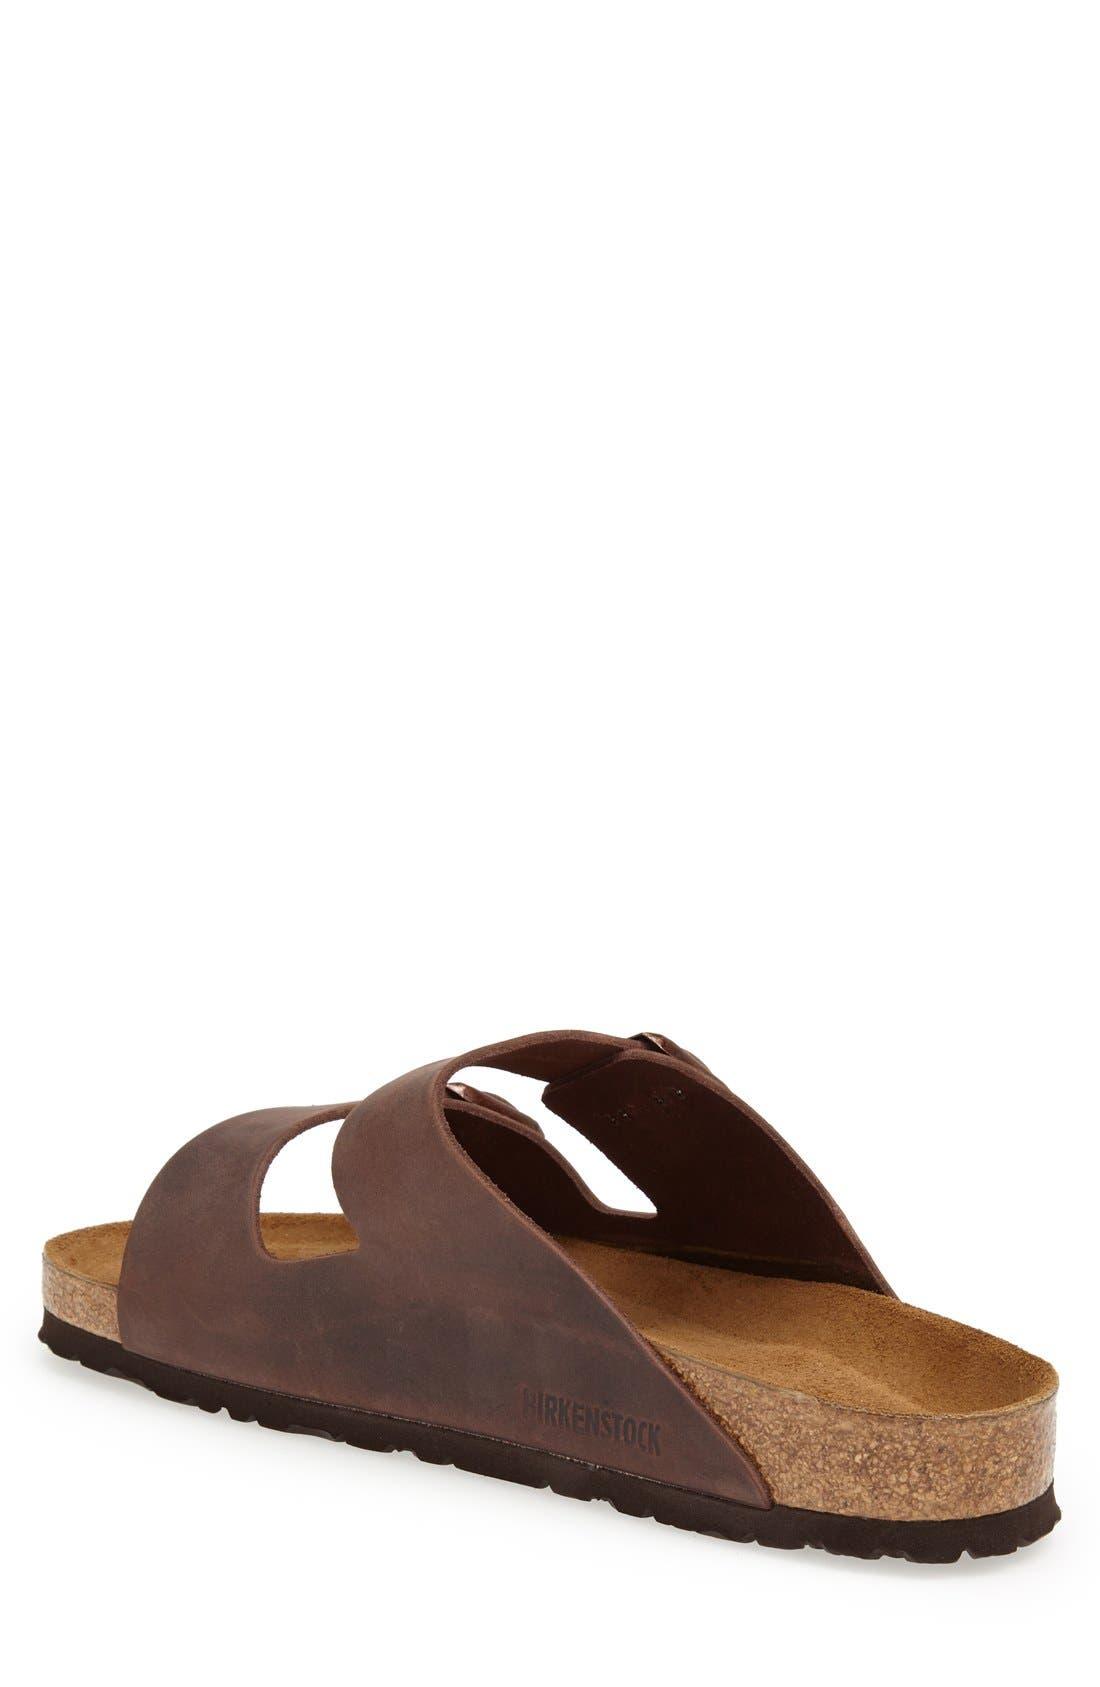 BIRKENSTOCK, Arizona Soft Slide Sandal, Alternate thumbnail 8, color, HABANA